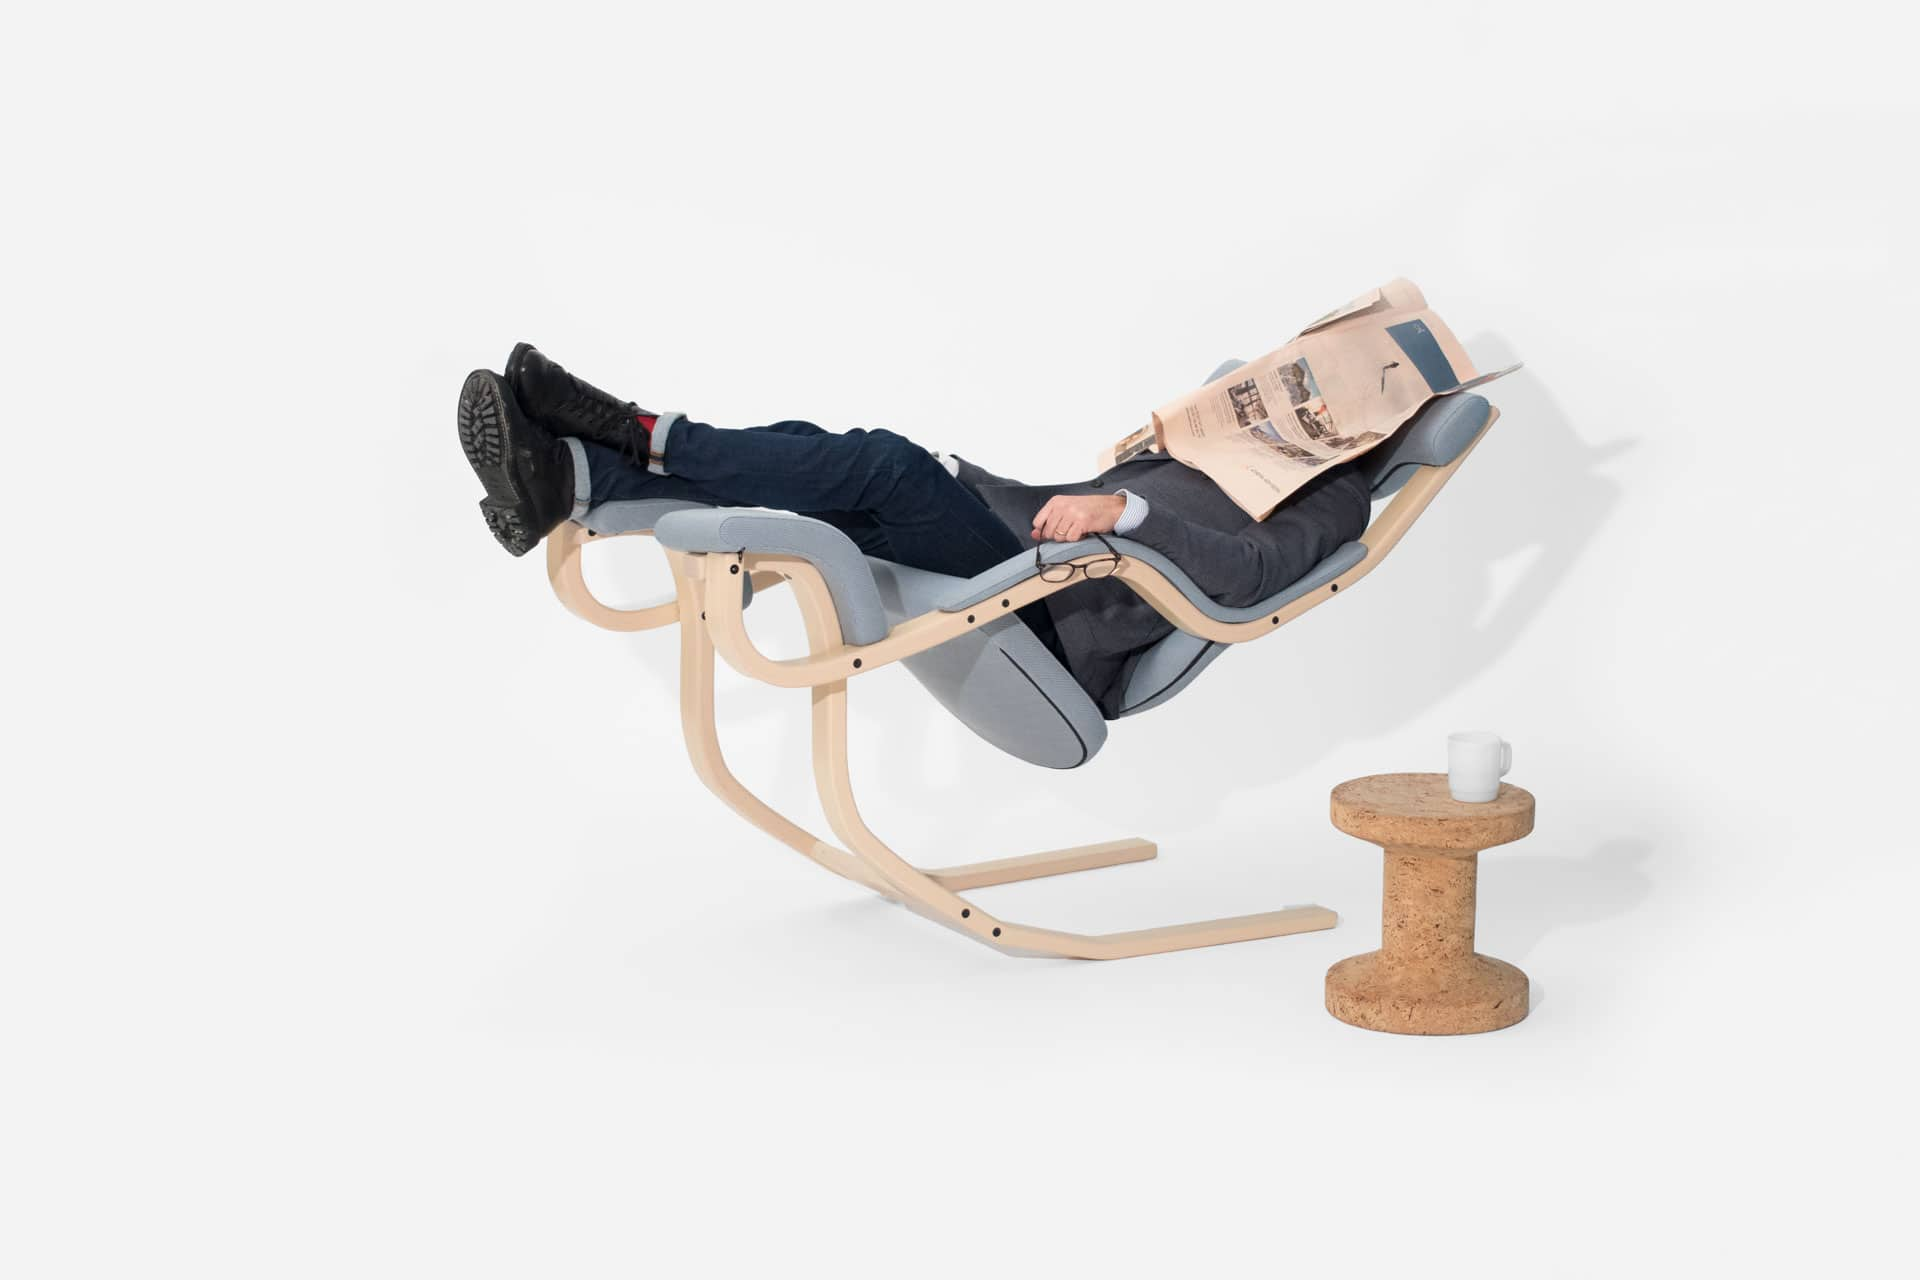 ruhesessel gravity balans kohler nat rlich einrichten. Black Bedroom Furniture Sets. Home Design Ideas